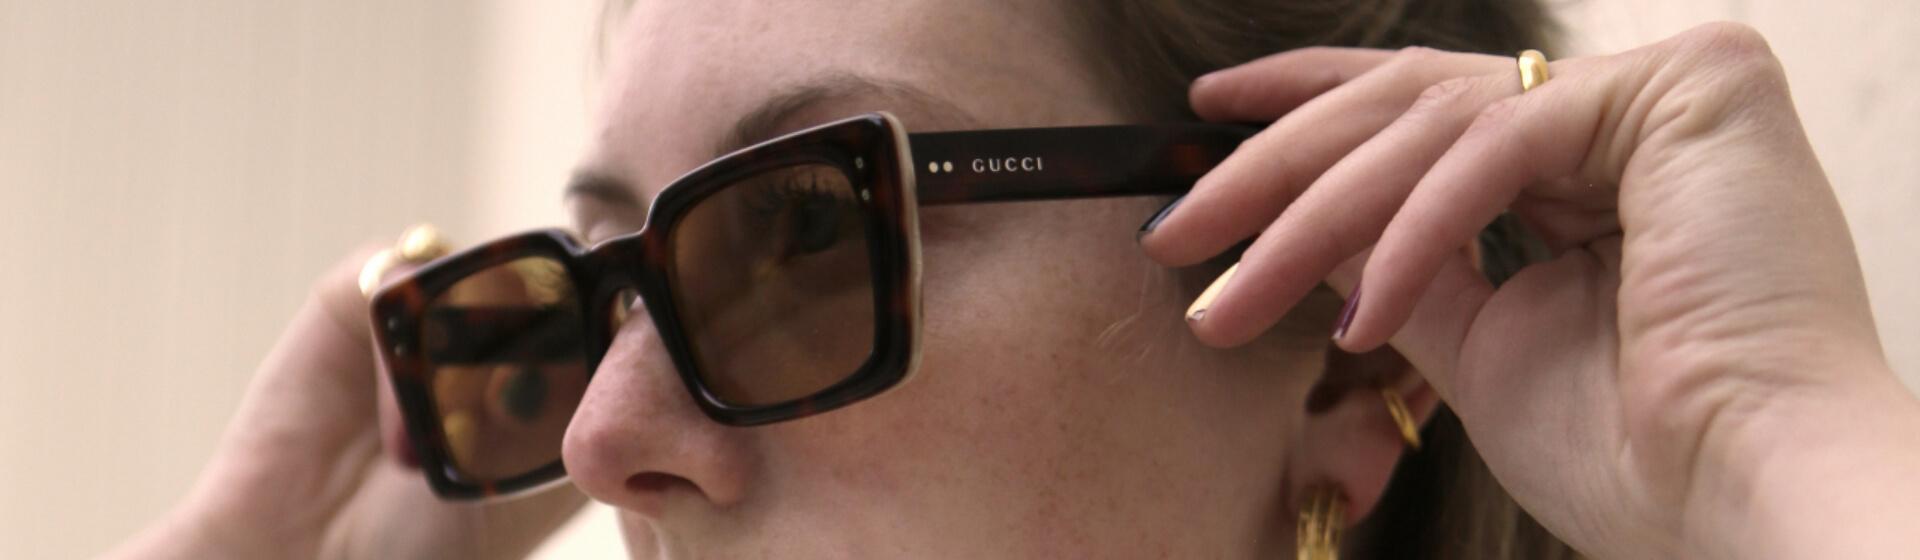 Sonnenbrillen Sommer 2020 Trends Formen Header